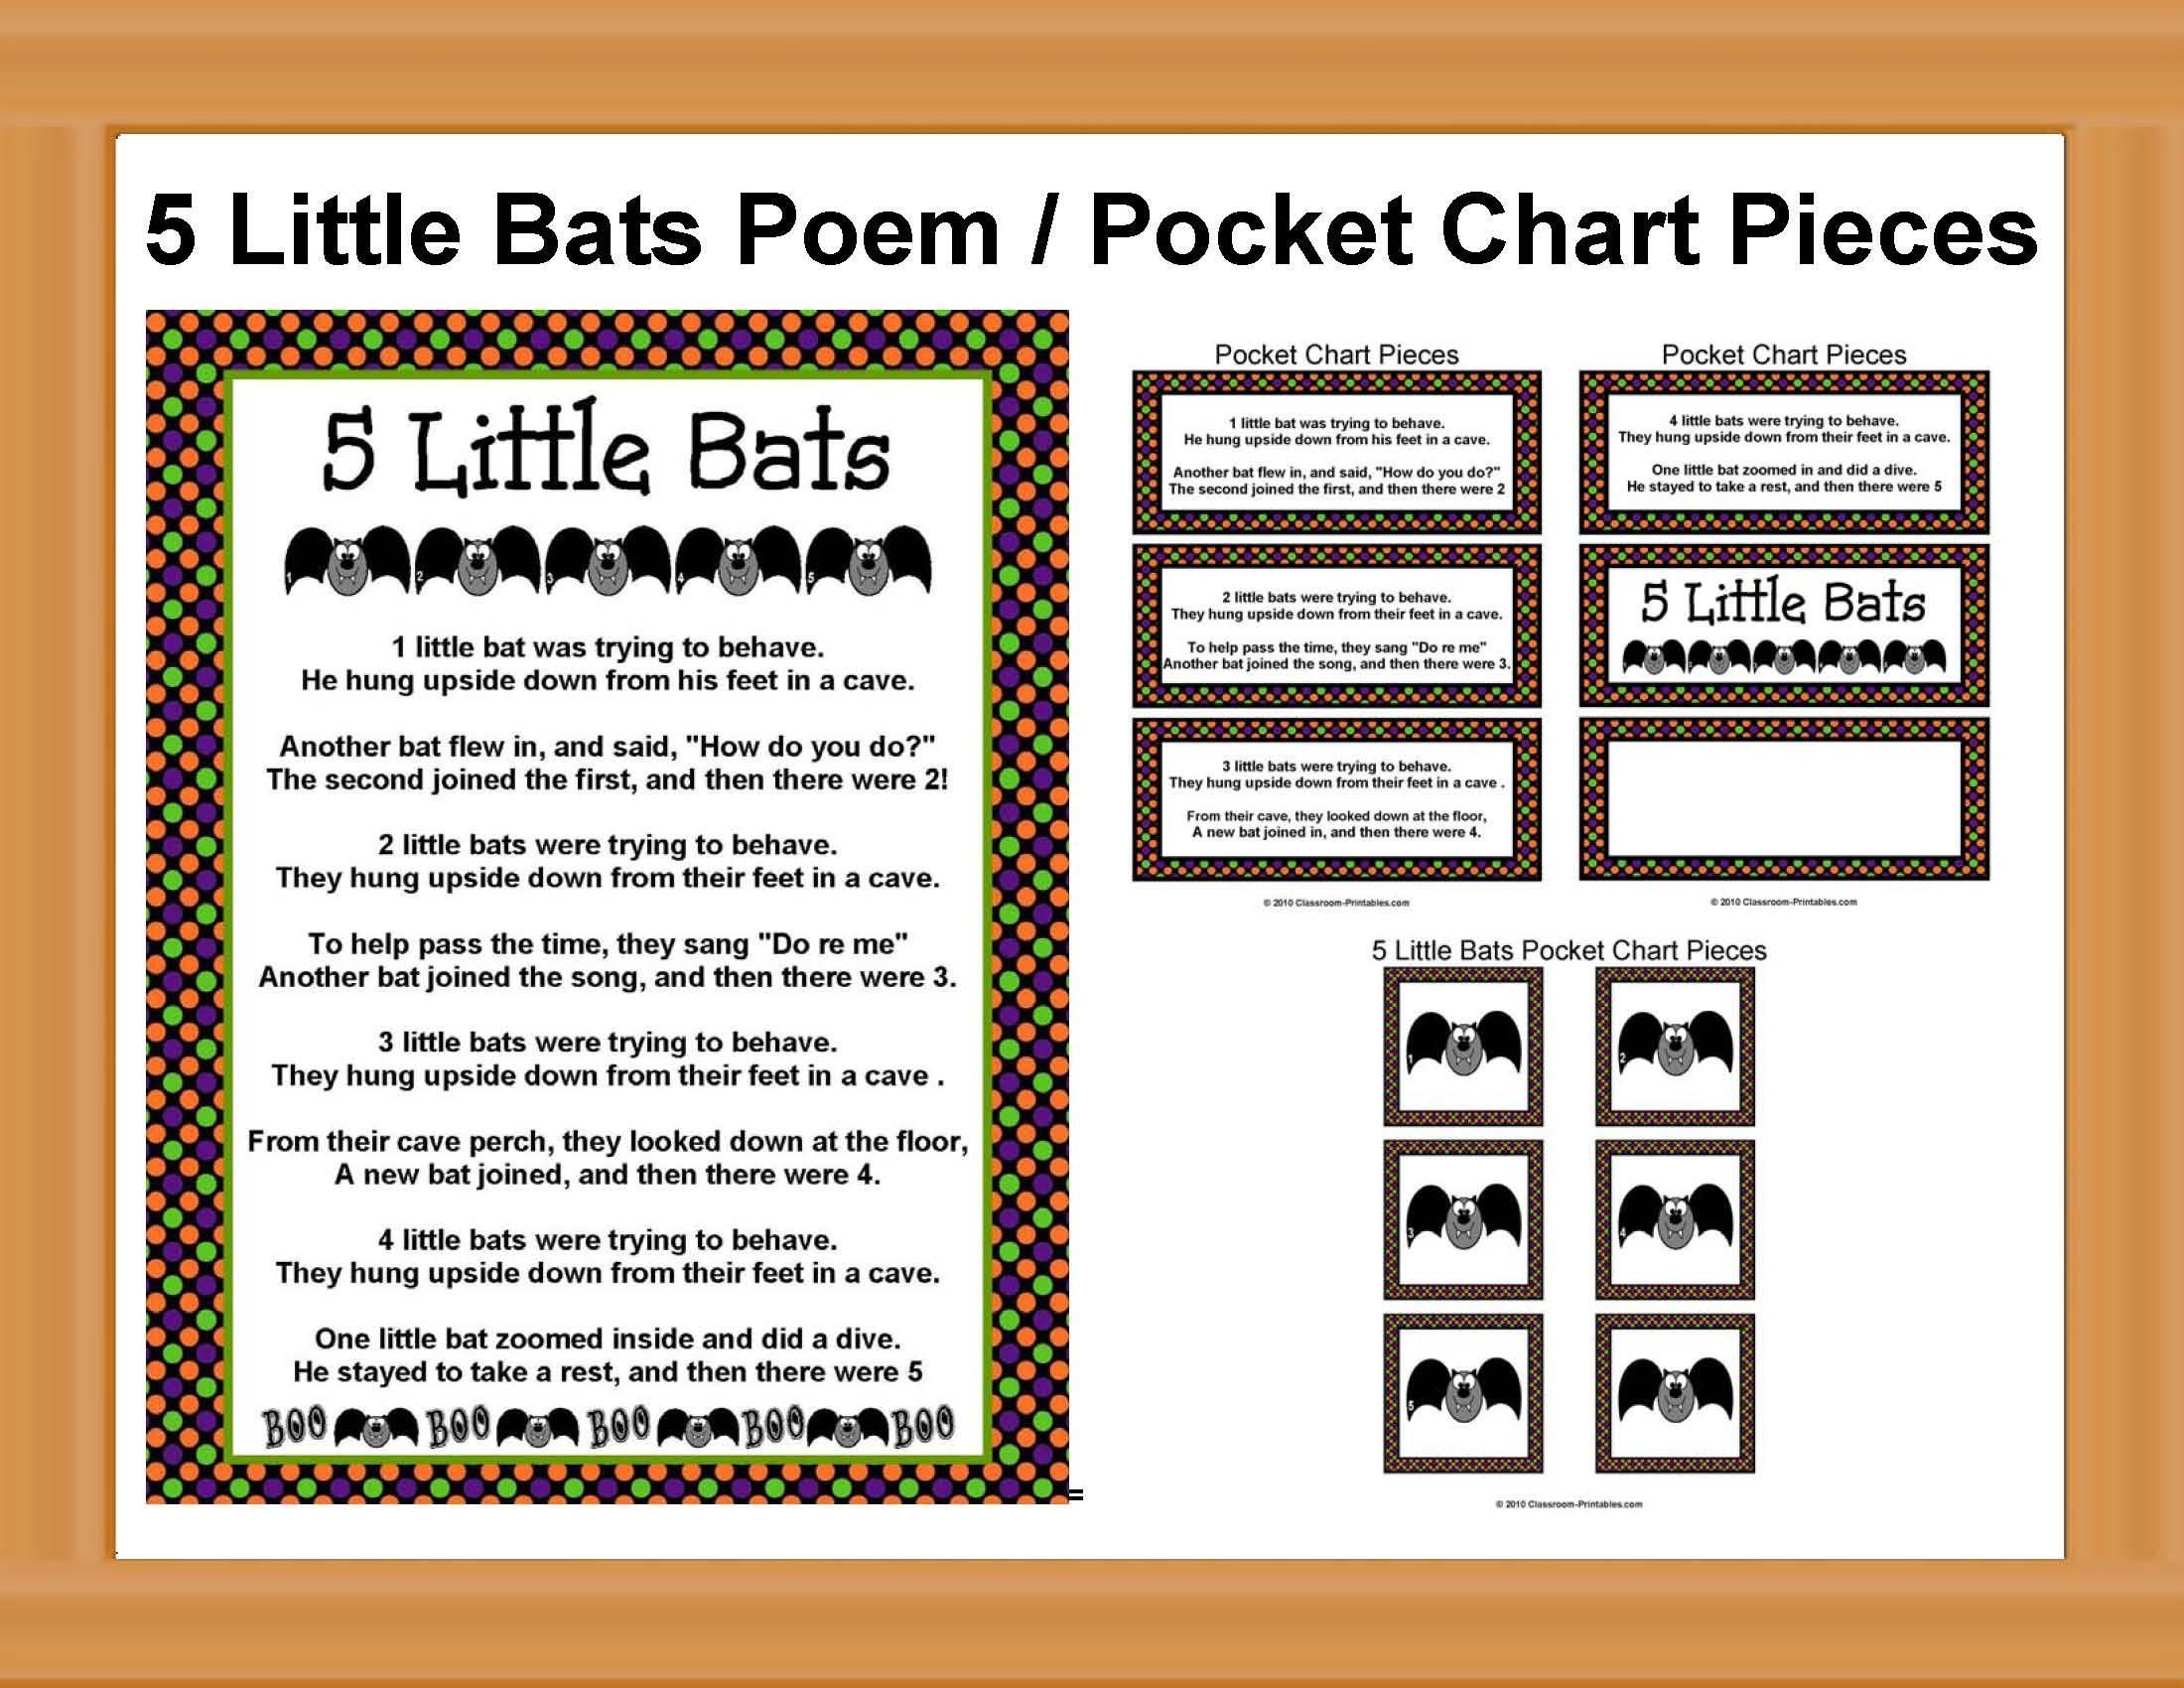 5 Little Bats Poem With Pocket Chart Pieces